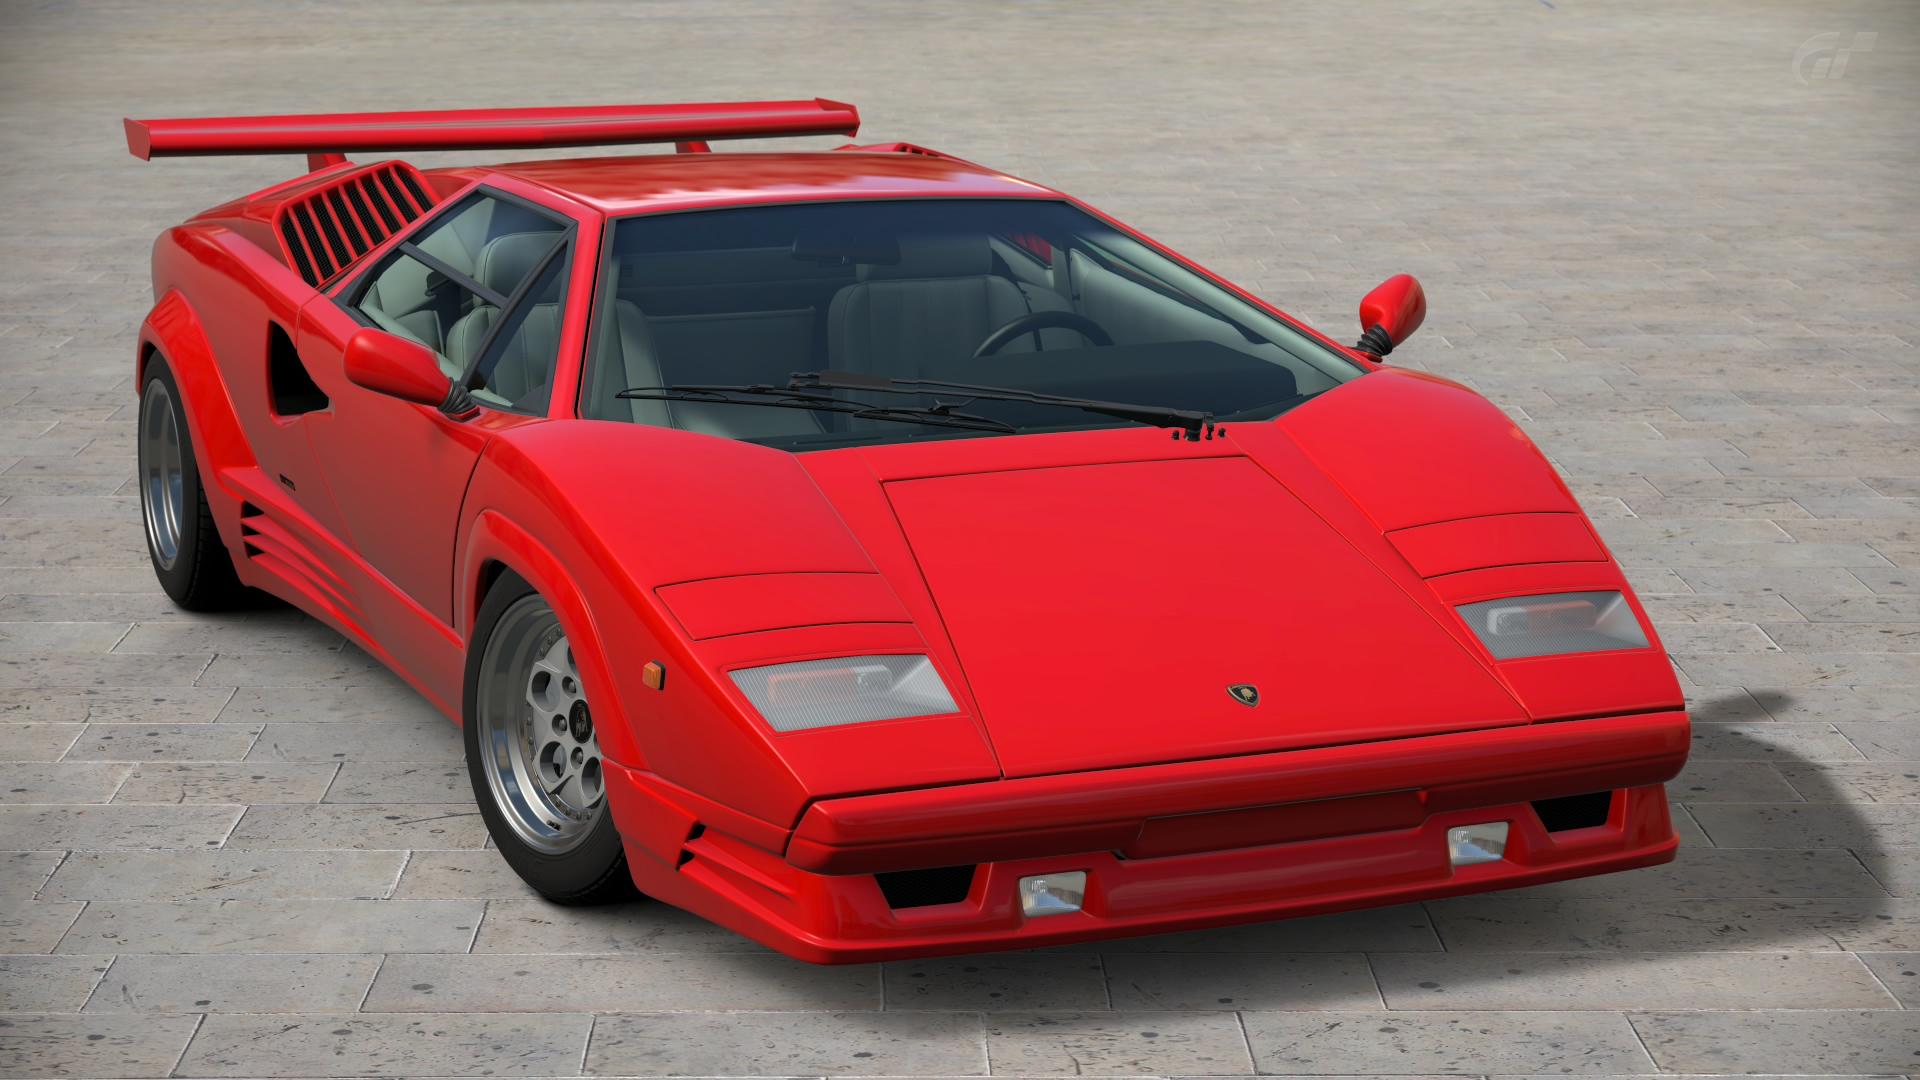 lamborghini_countach_25th_anniversary__gt6__by_vertualissimo-d774qy6 Elegant Lamborghini Countach 25th Anniversary Specs Cars Trend